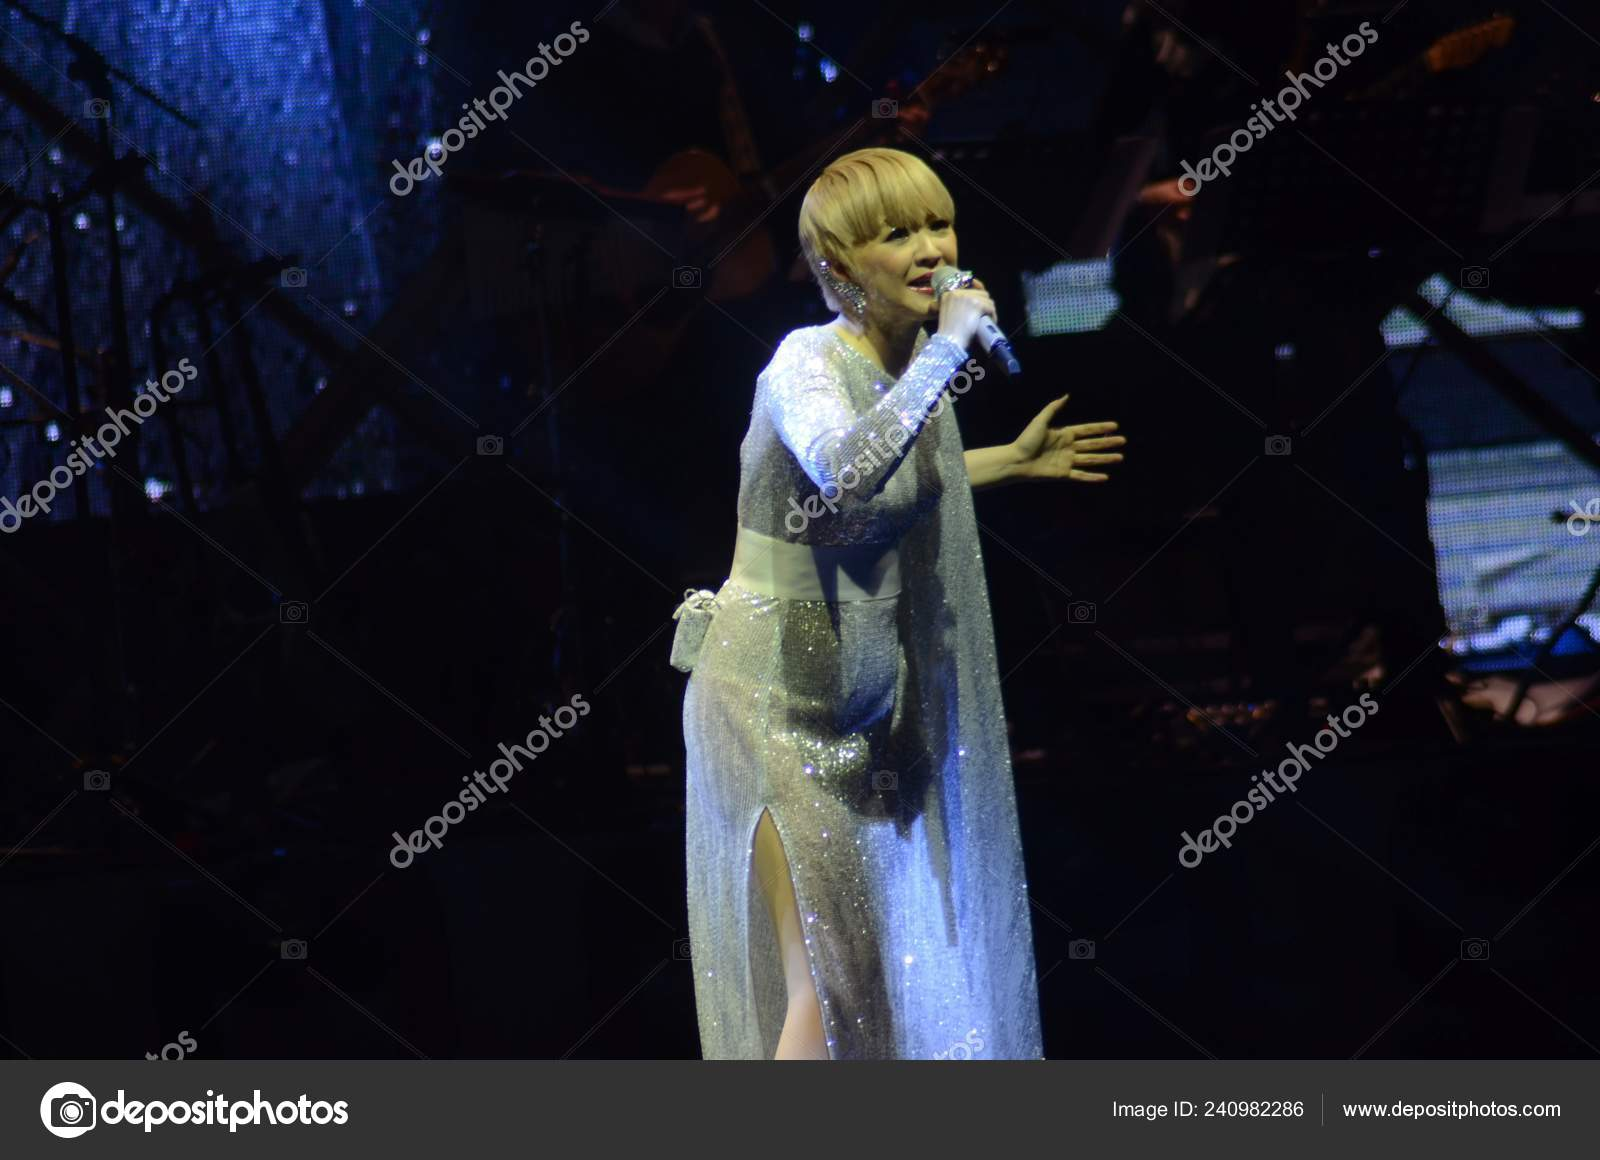 Hong Kong Singer Priscilla Chan Performs Concert Mark 30Th